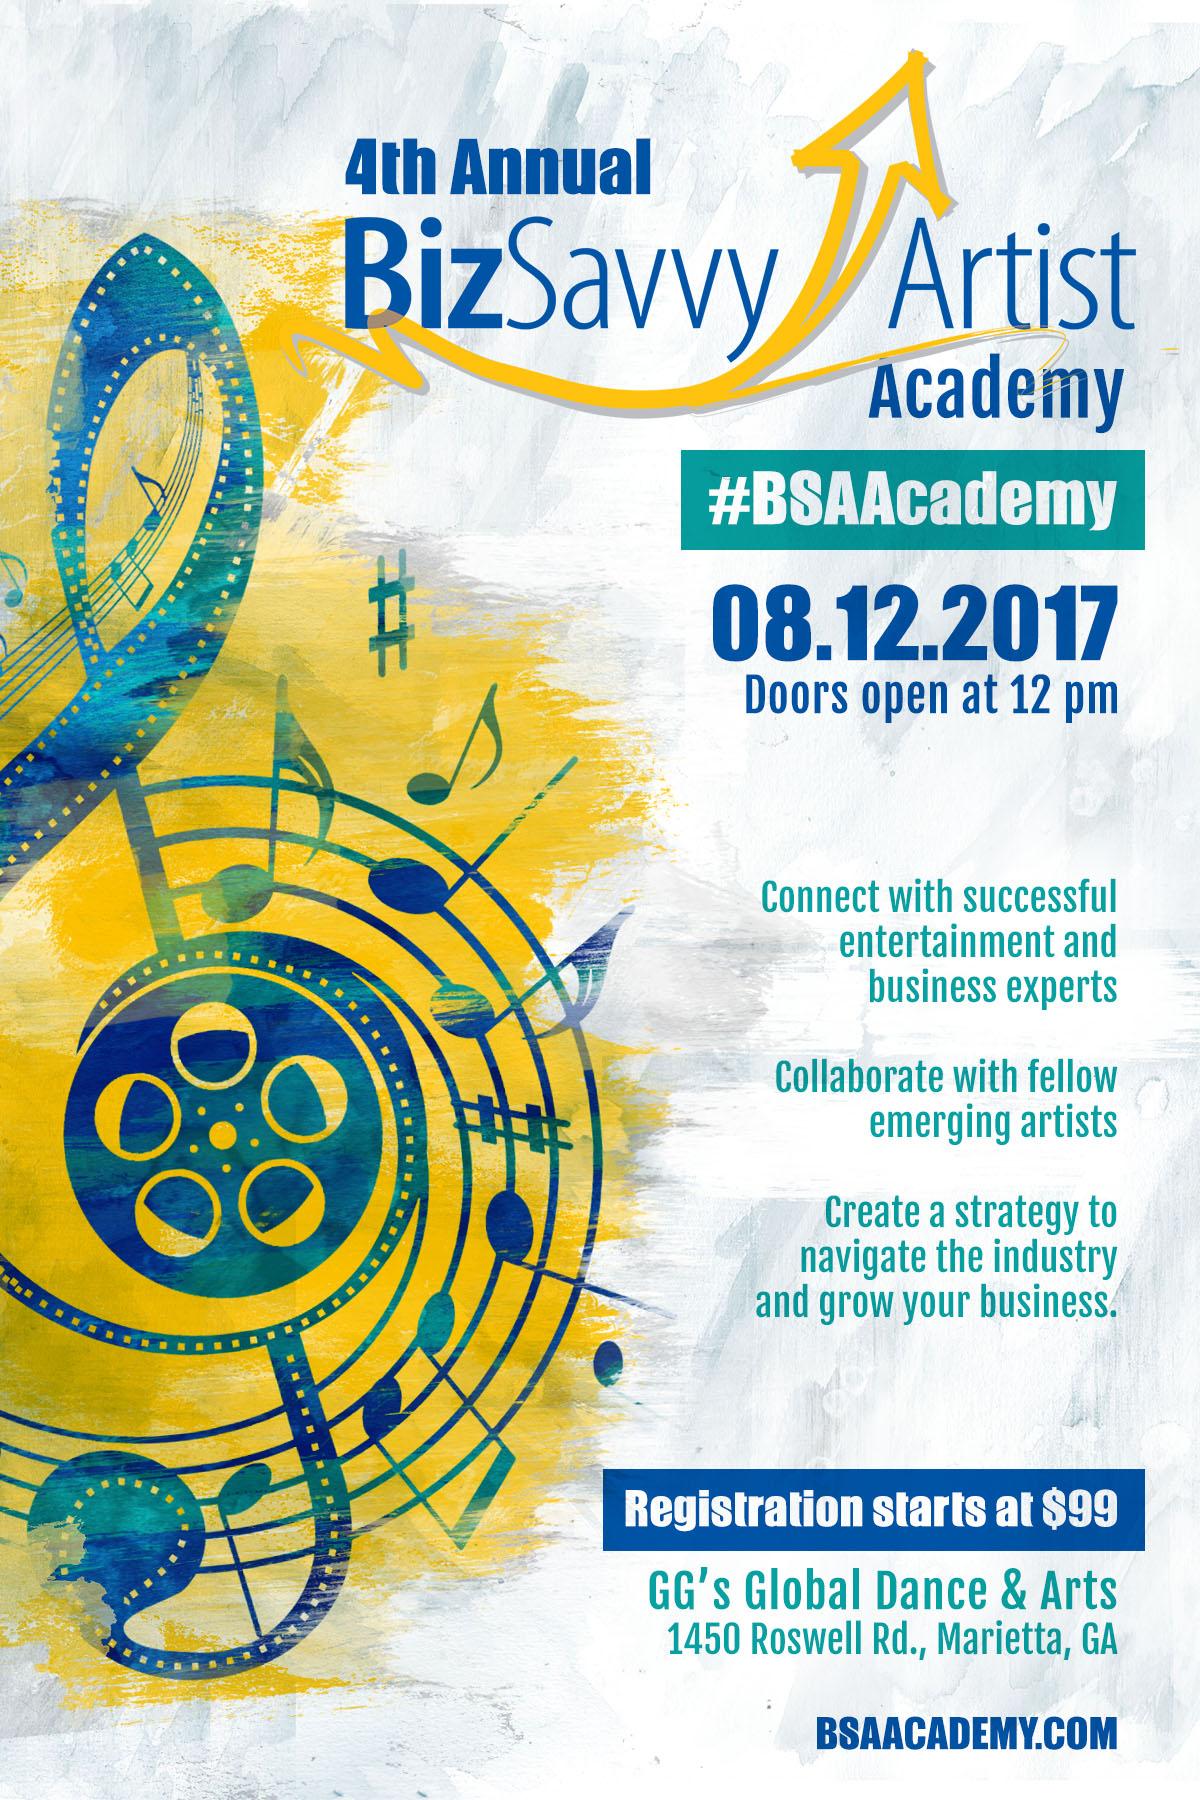 Biz Savvy Artist Academy 2017 flyer